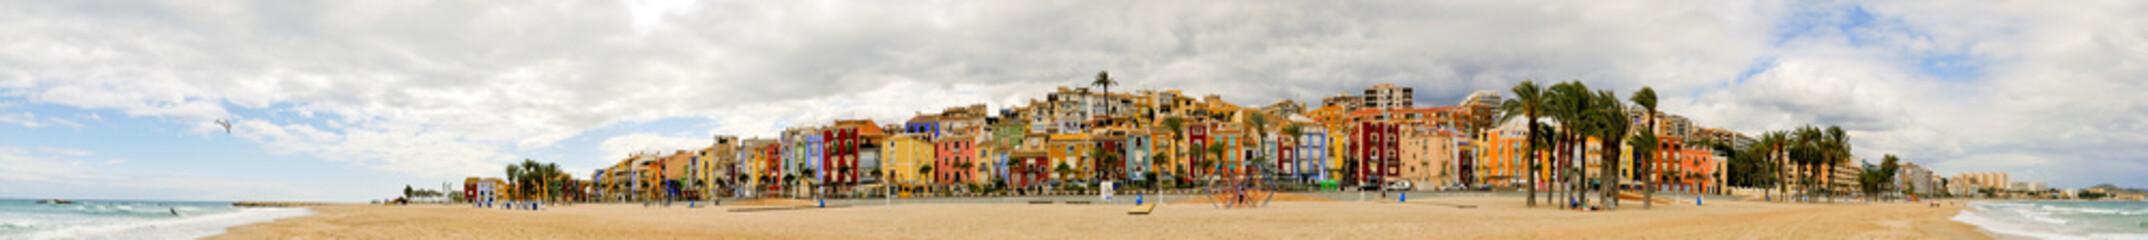 Panorama Spanien